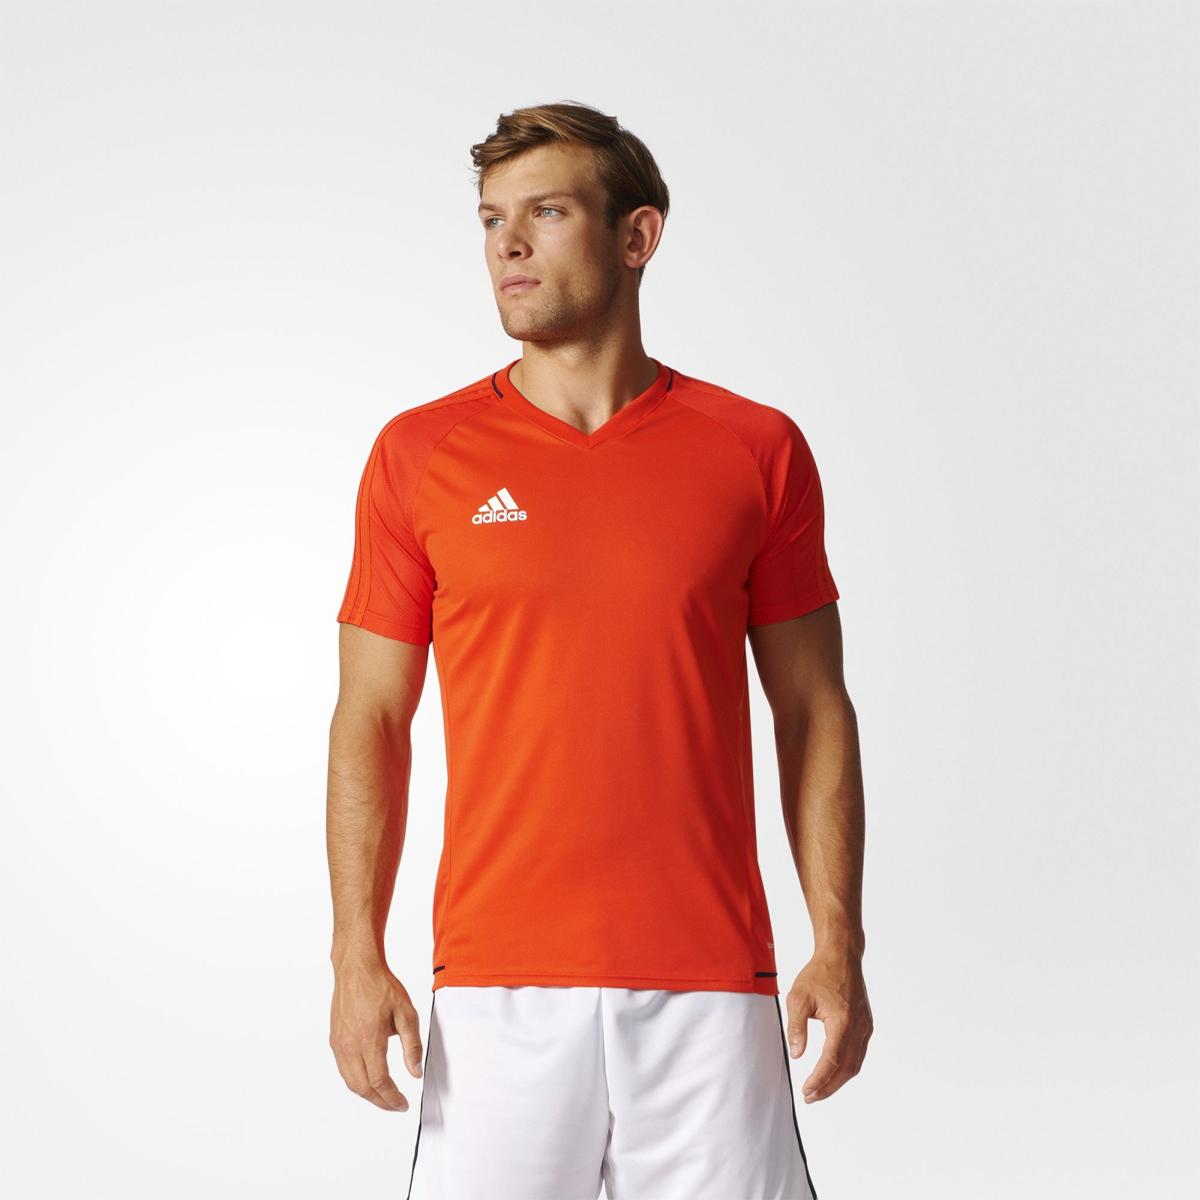 adidas TIRO 17 Koszulka treningowa / Rozmiar S